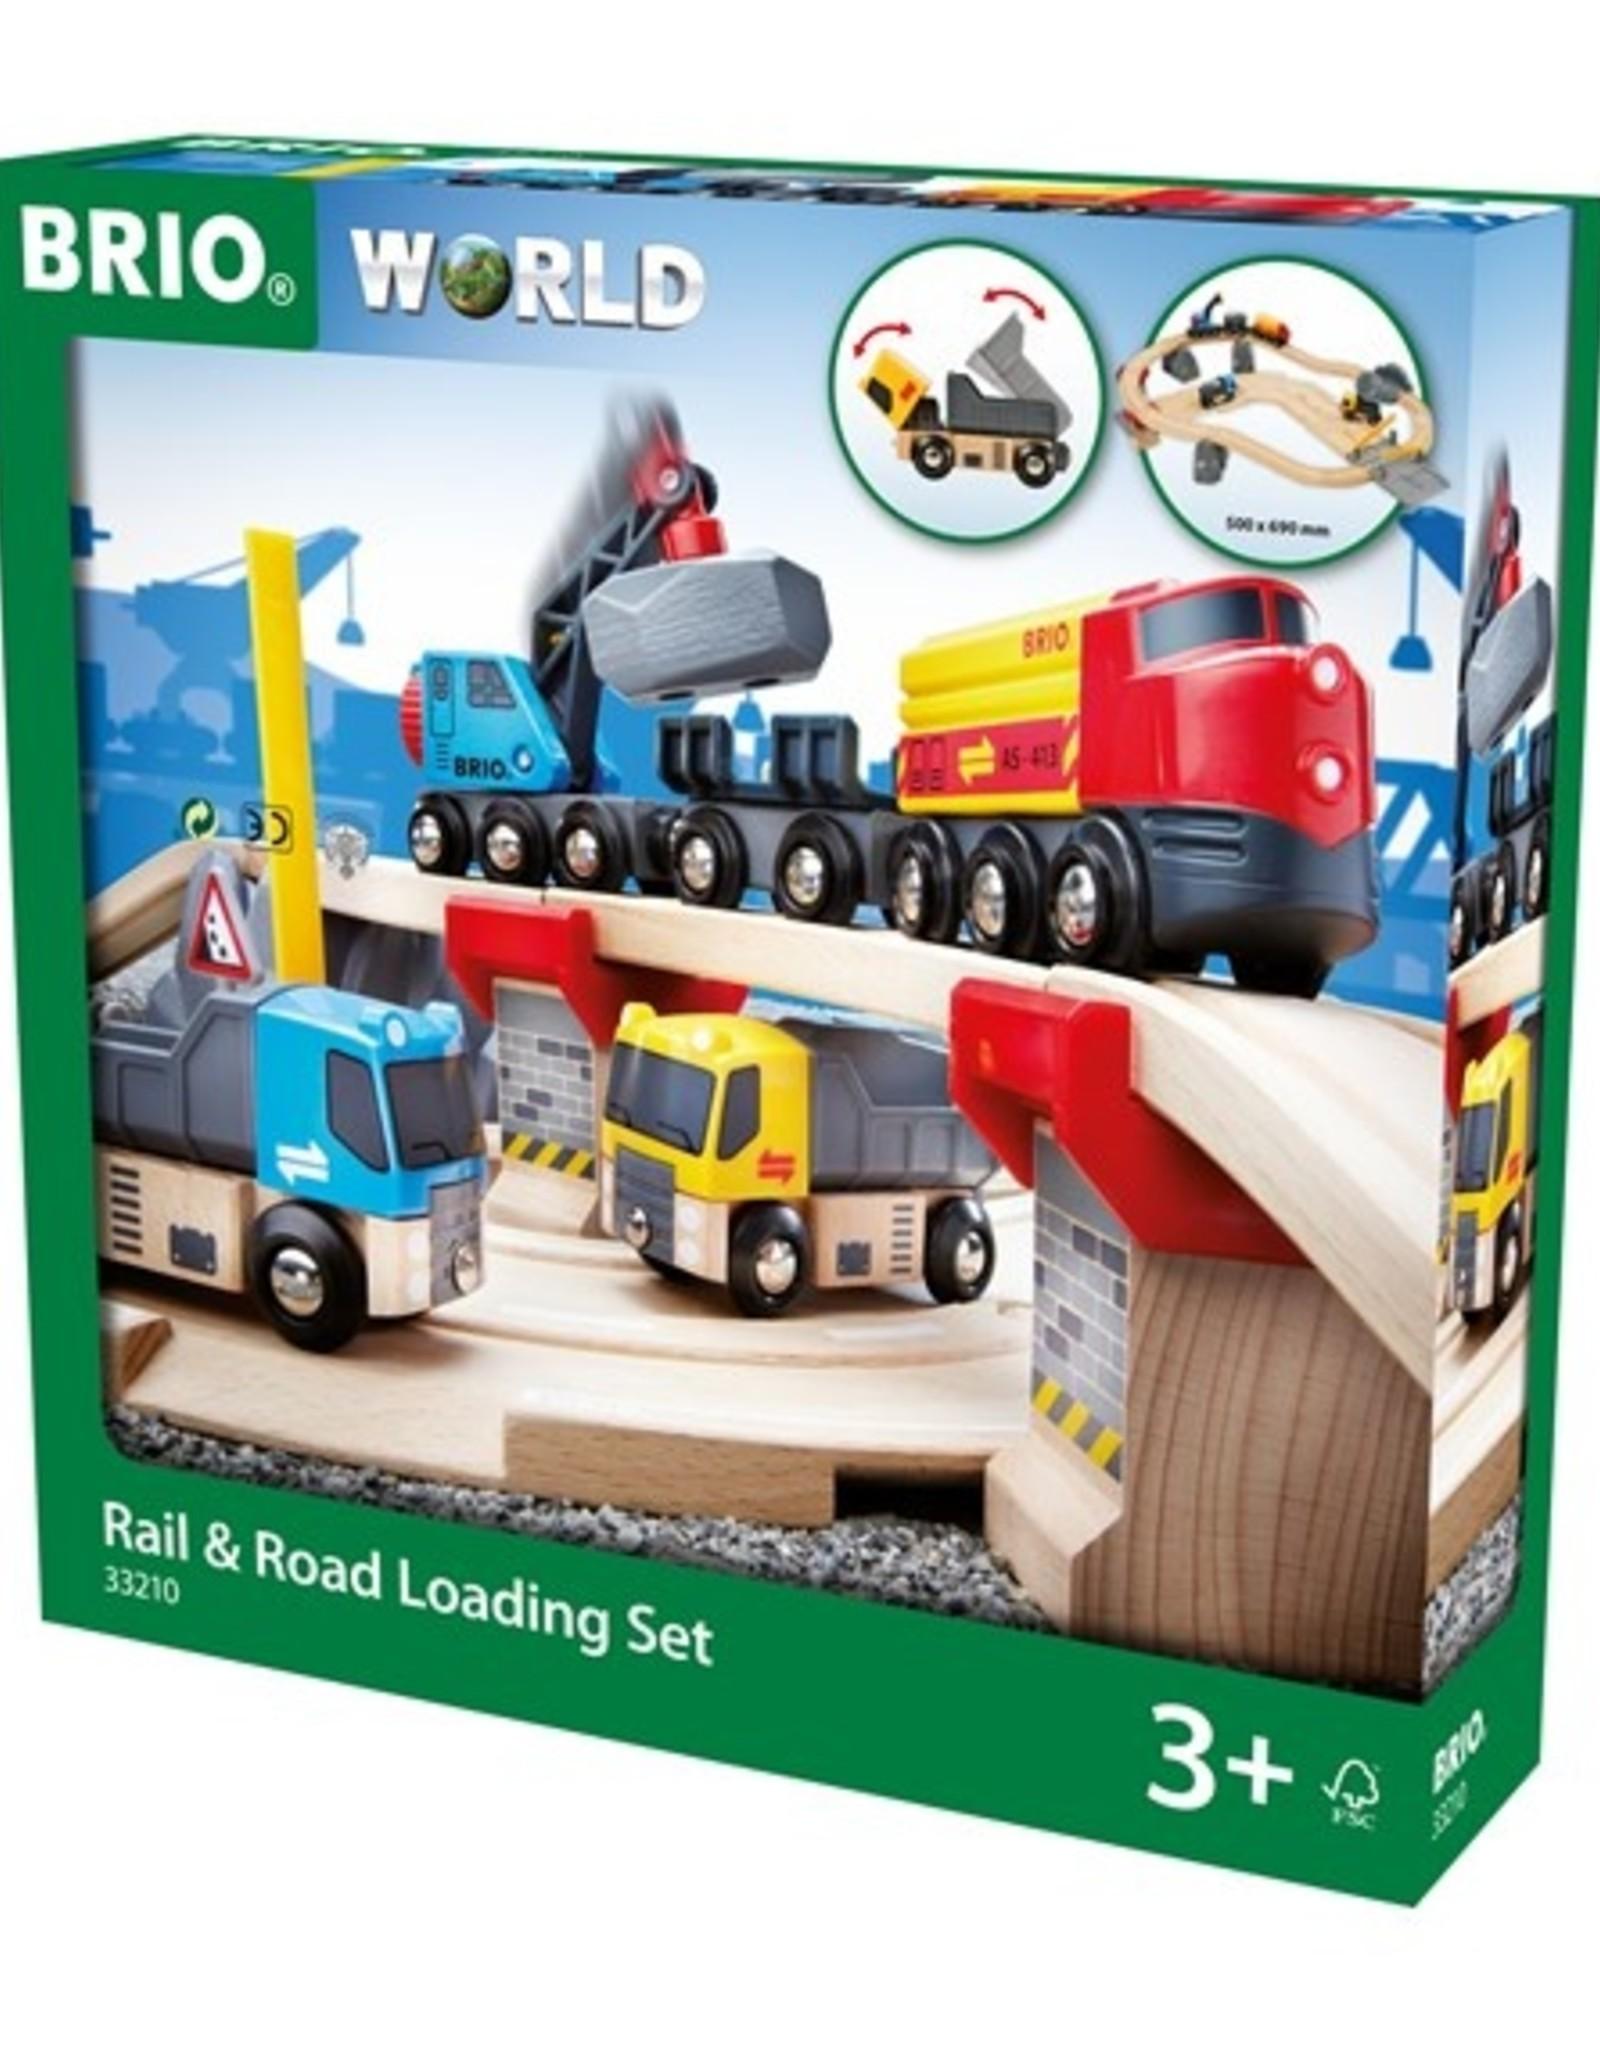 Brio Transportset Weg&Spoor